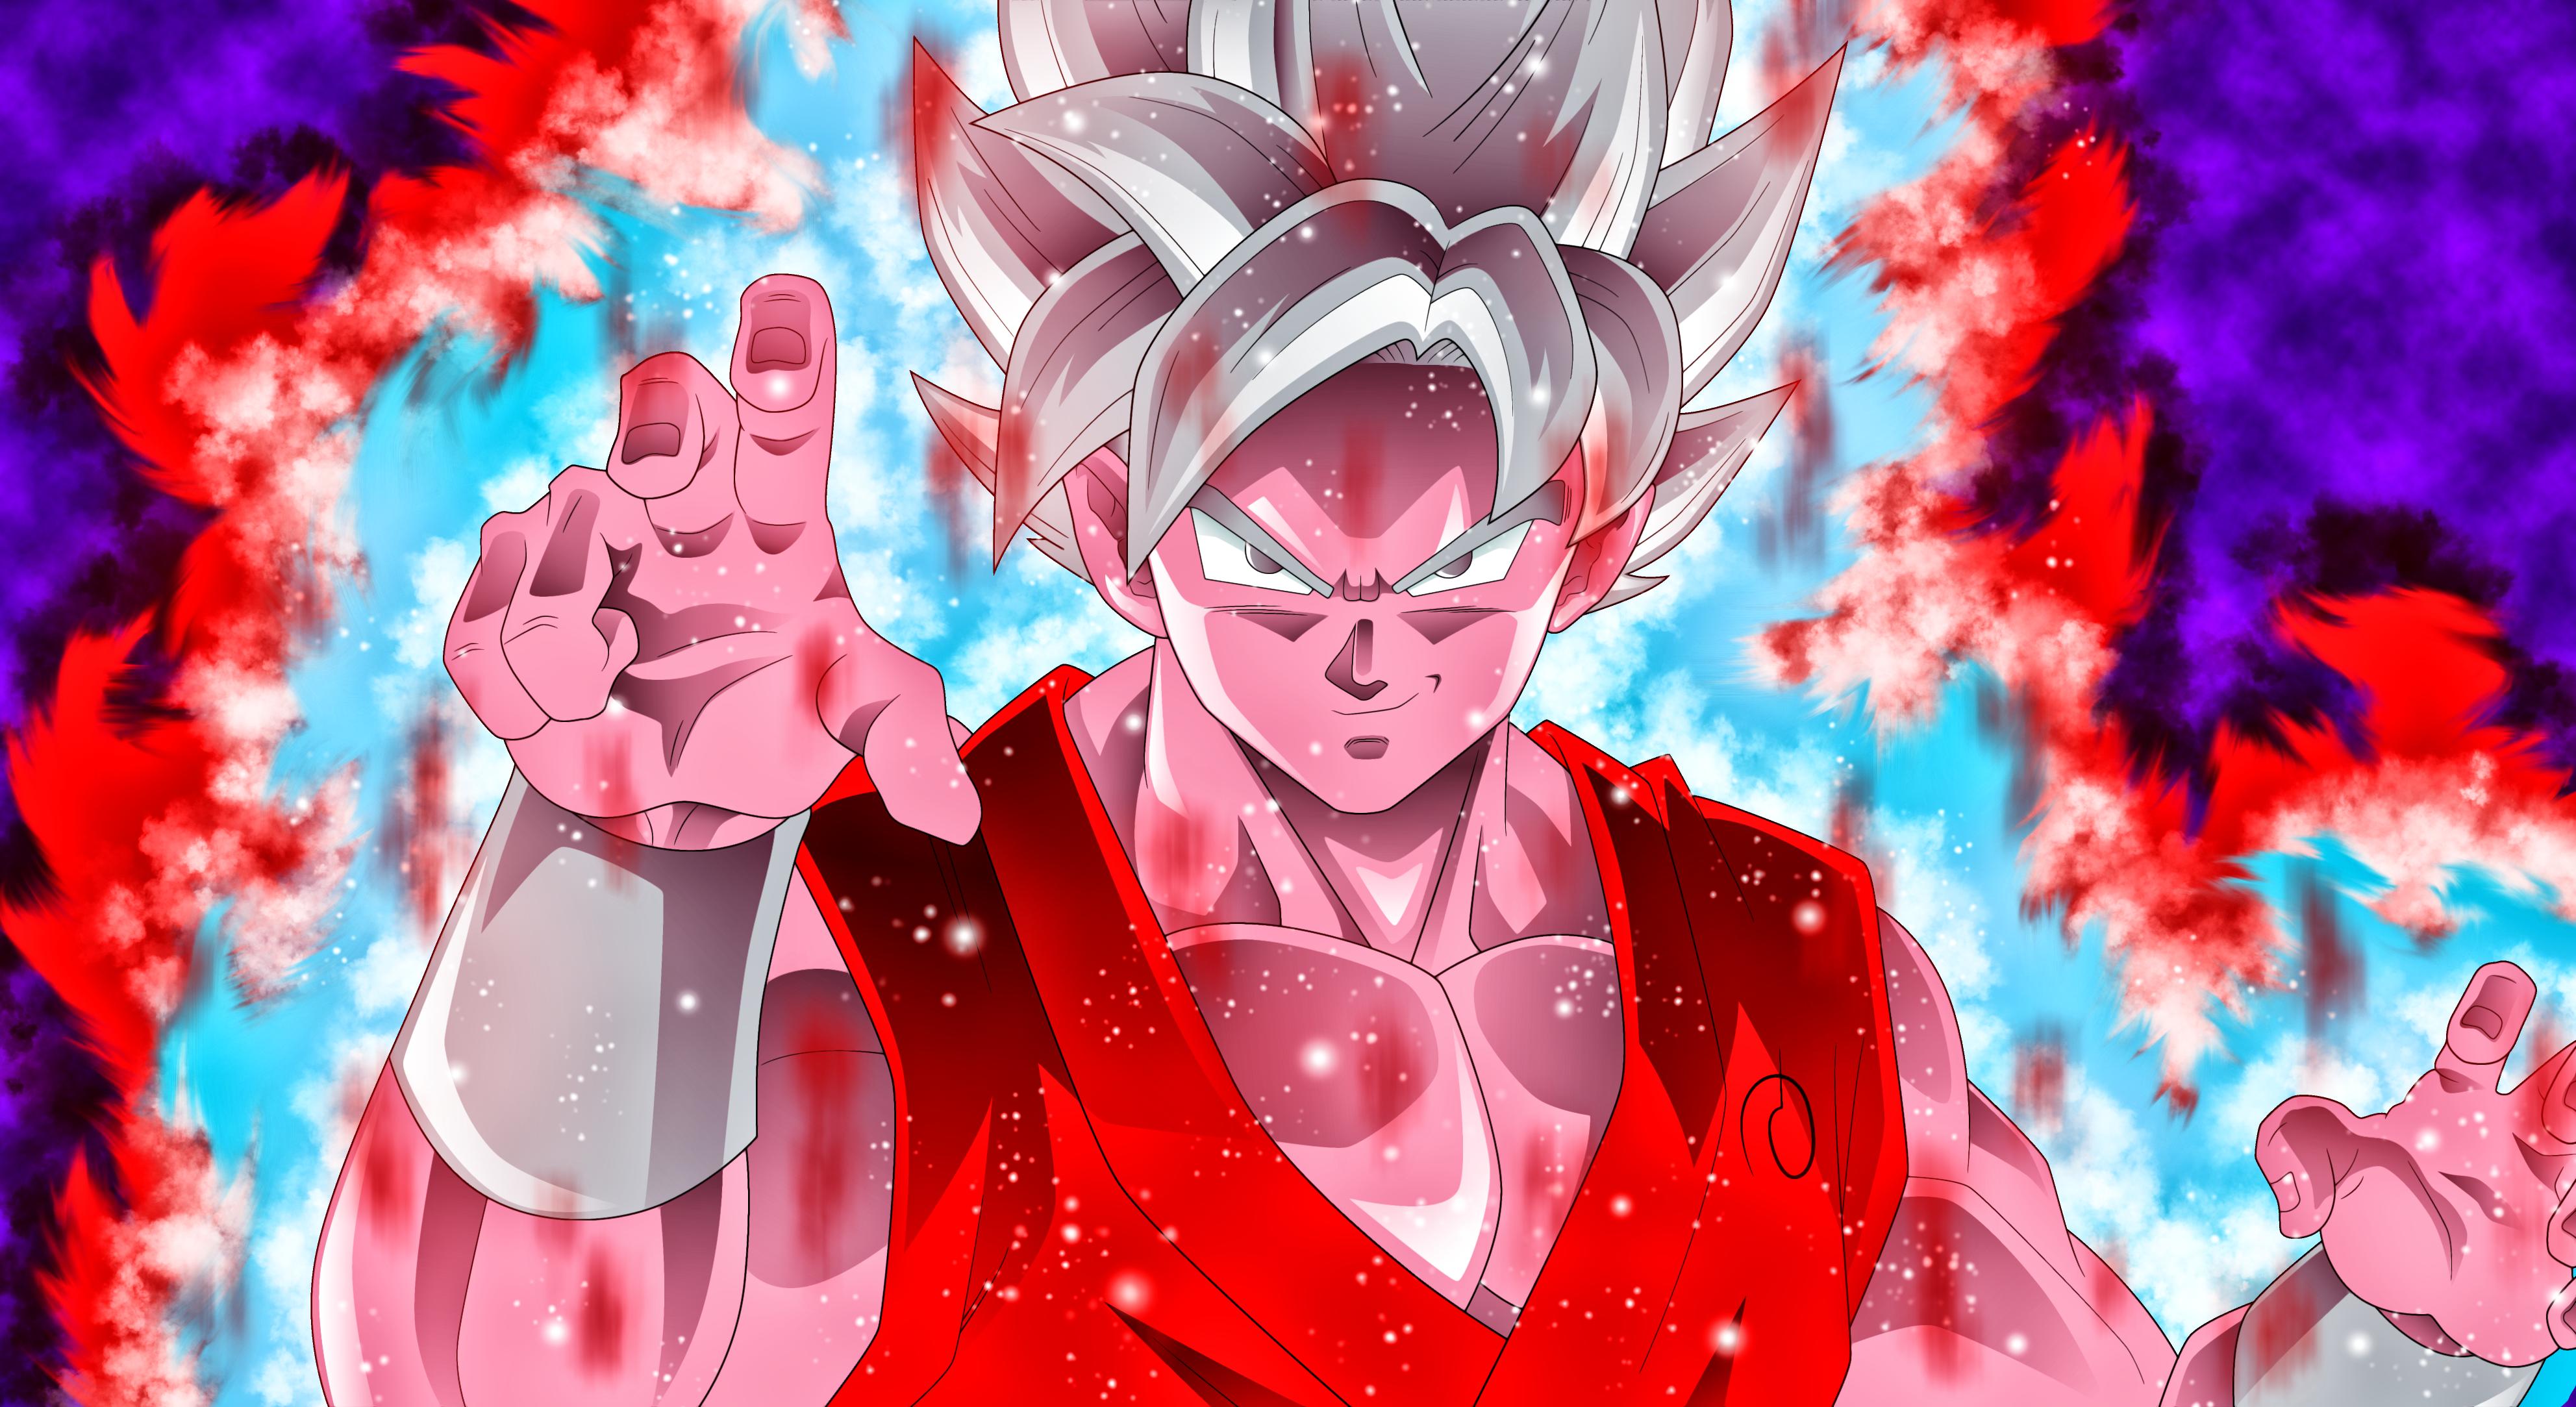 Dragon Ball Super 4k Ultra Hd Wallpaper Background Image